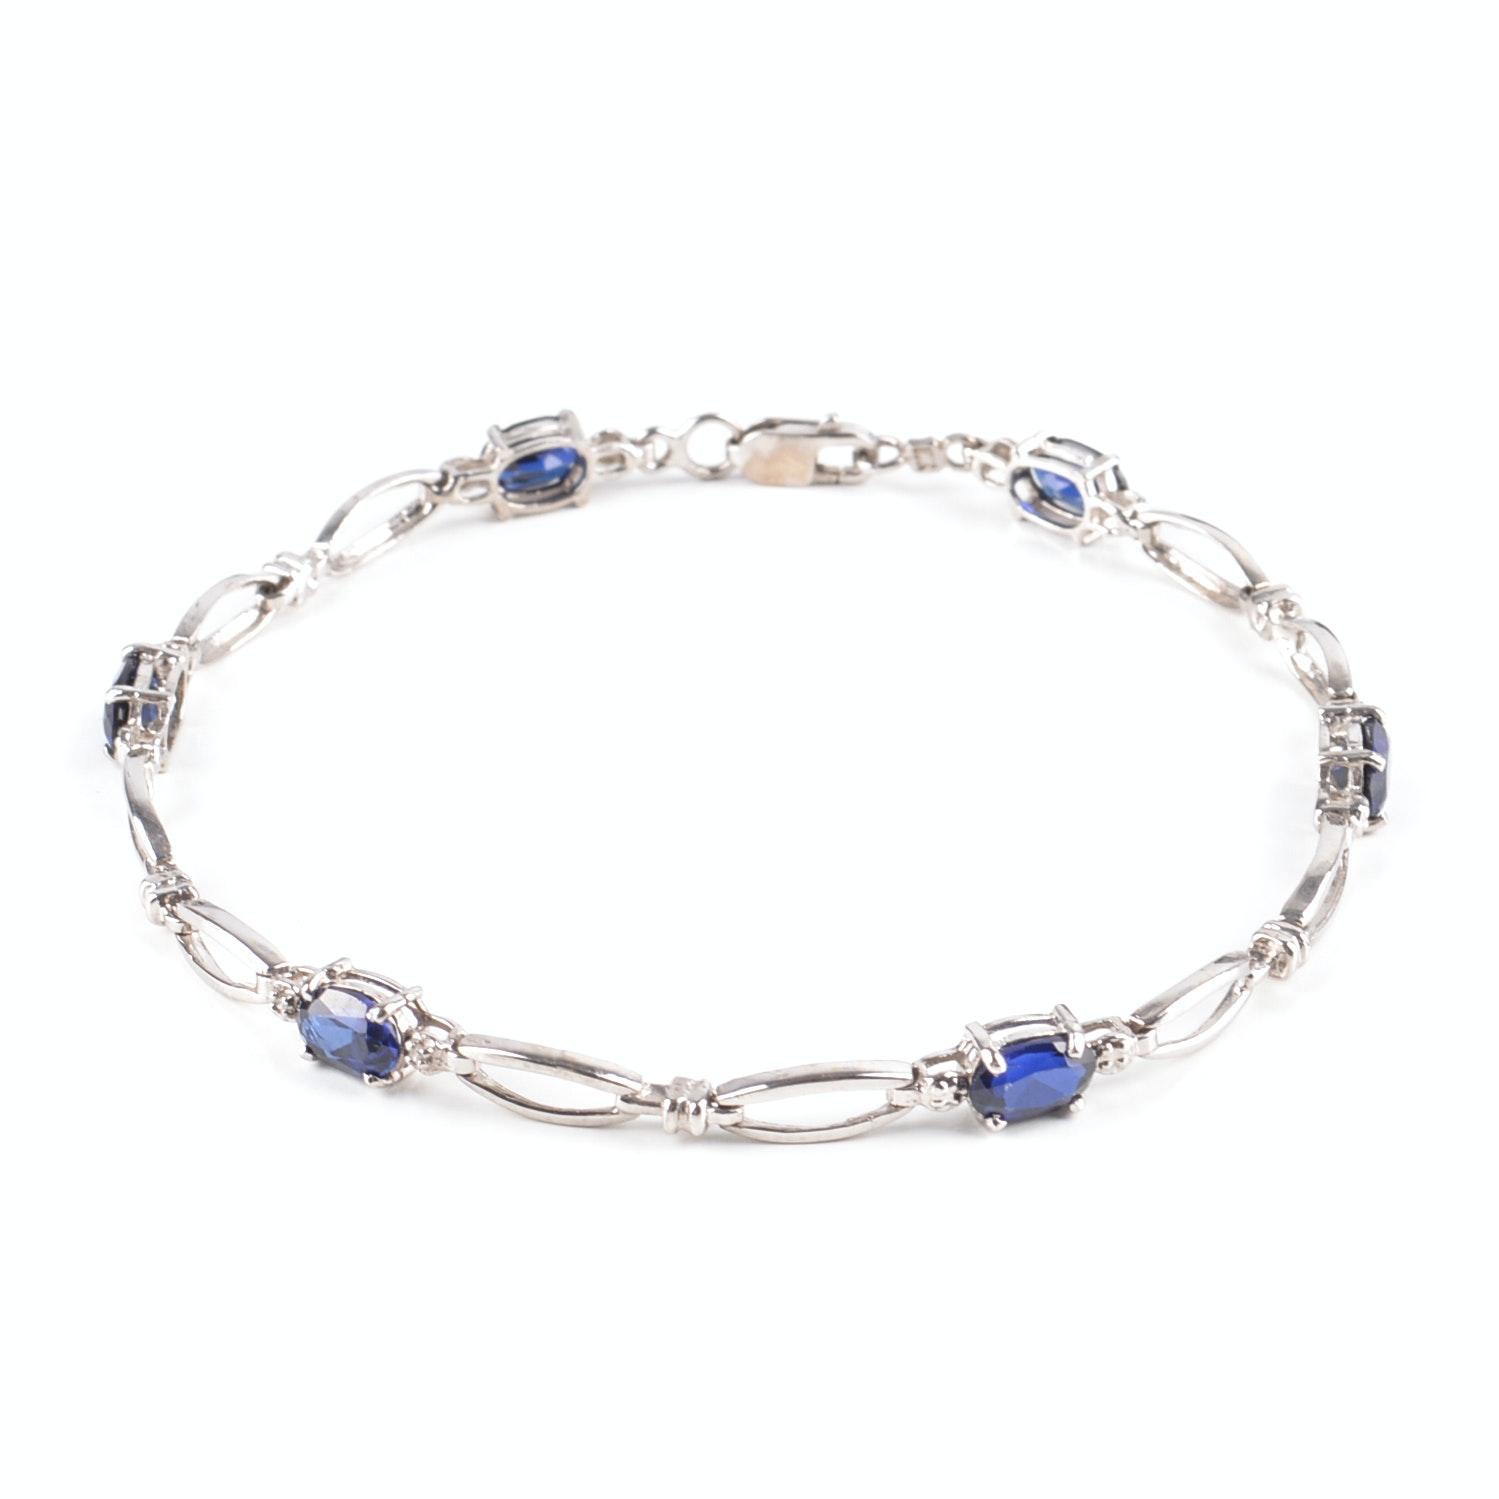 10K White Gold Synthetic Sapphire and Diamond Bracelet